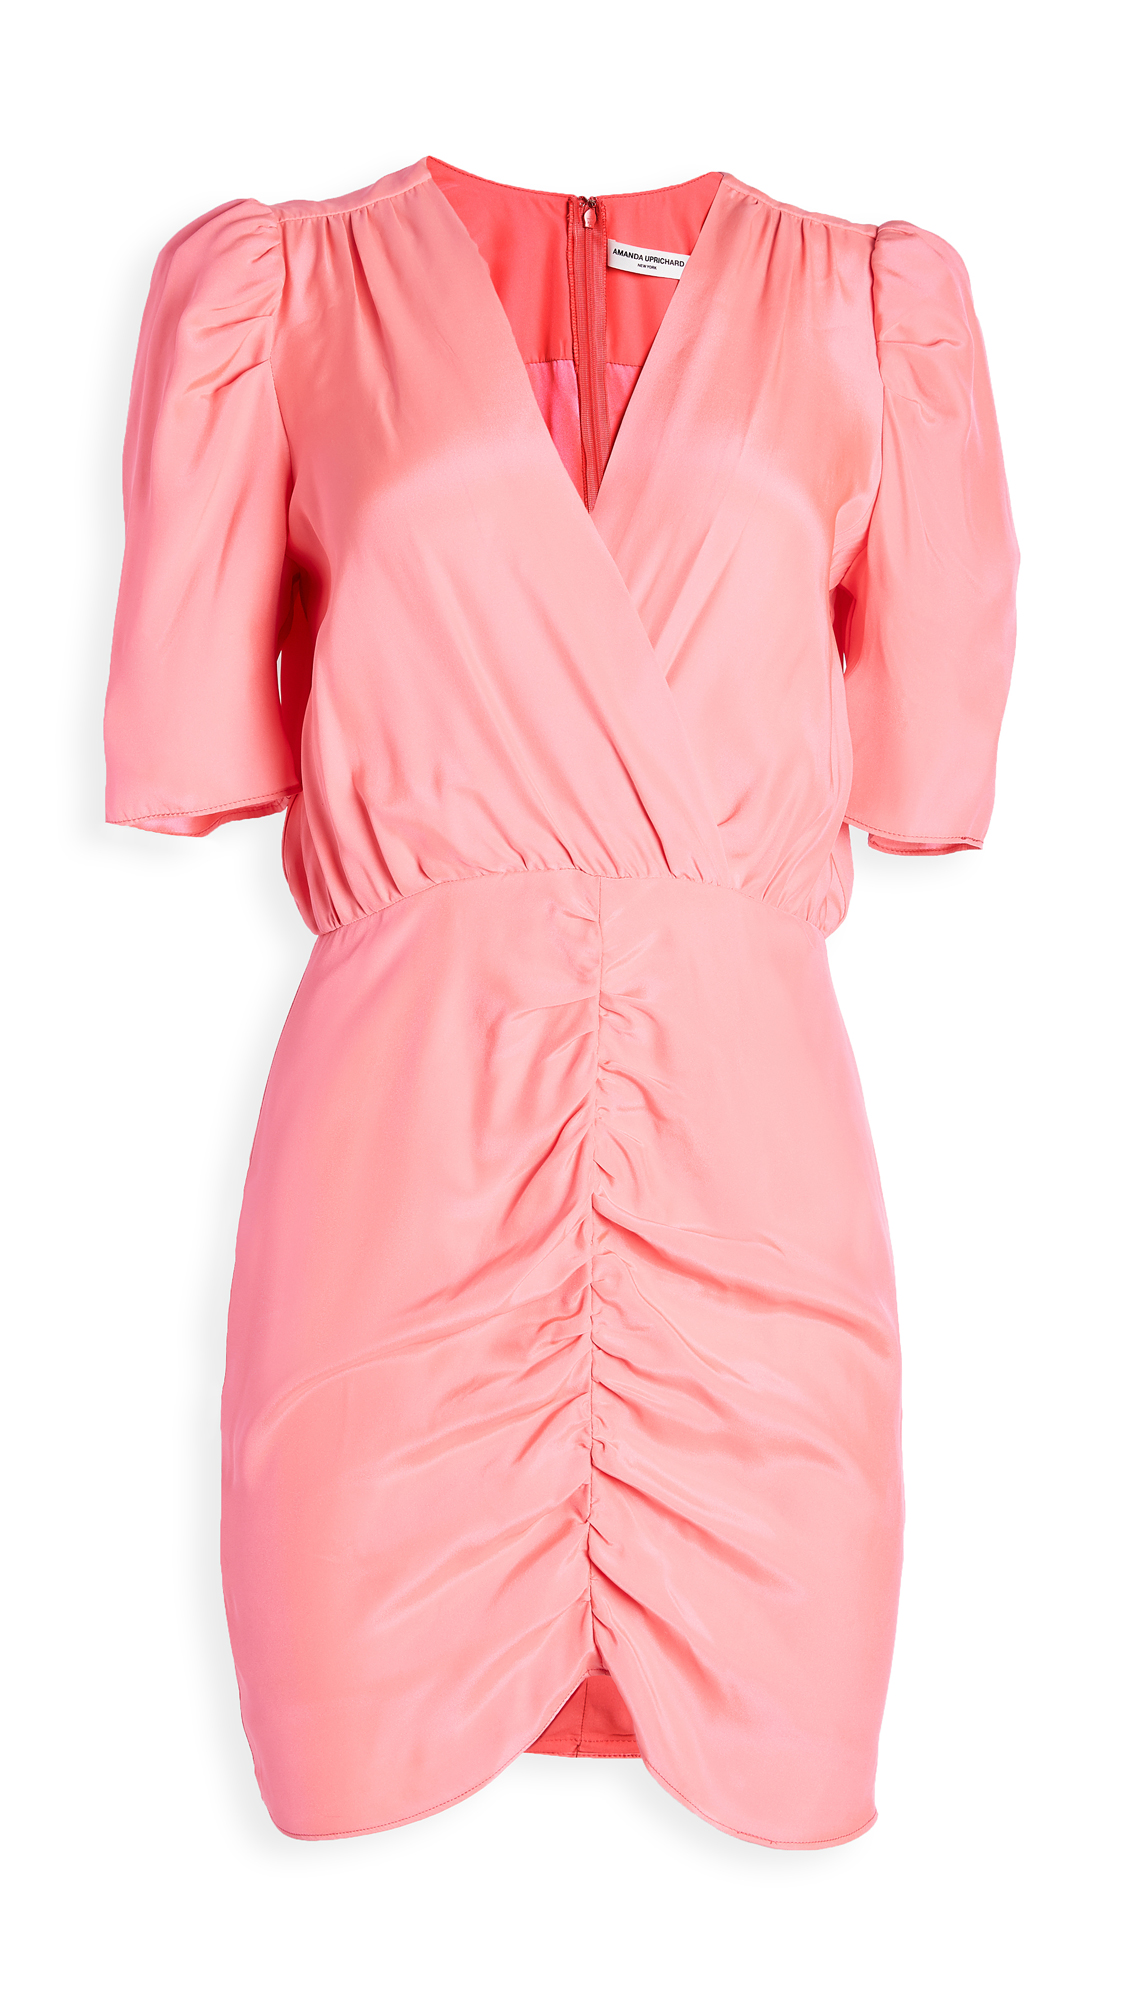 Amanda Uprichard Sheena Dress - 30% Off Sale